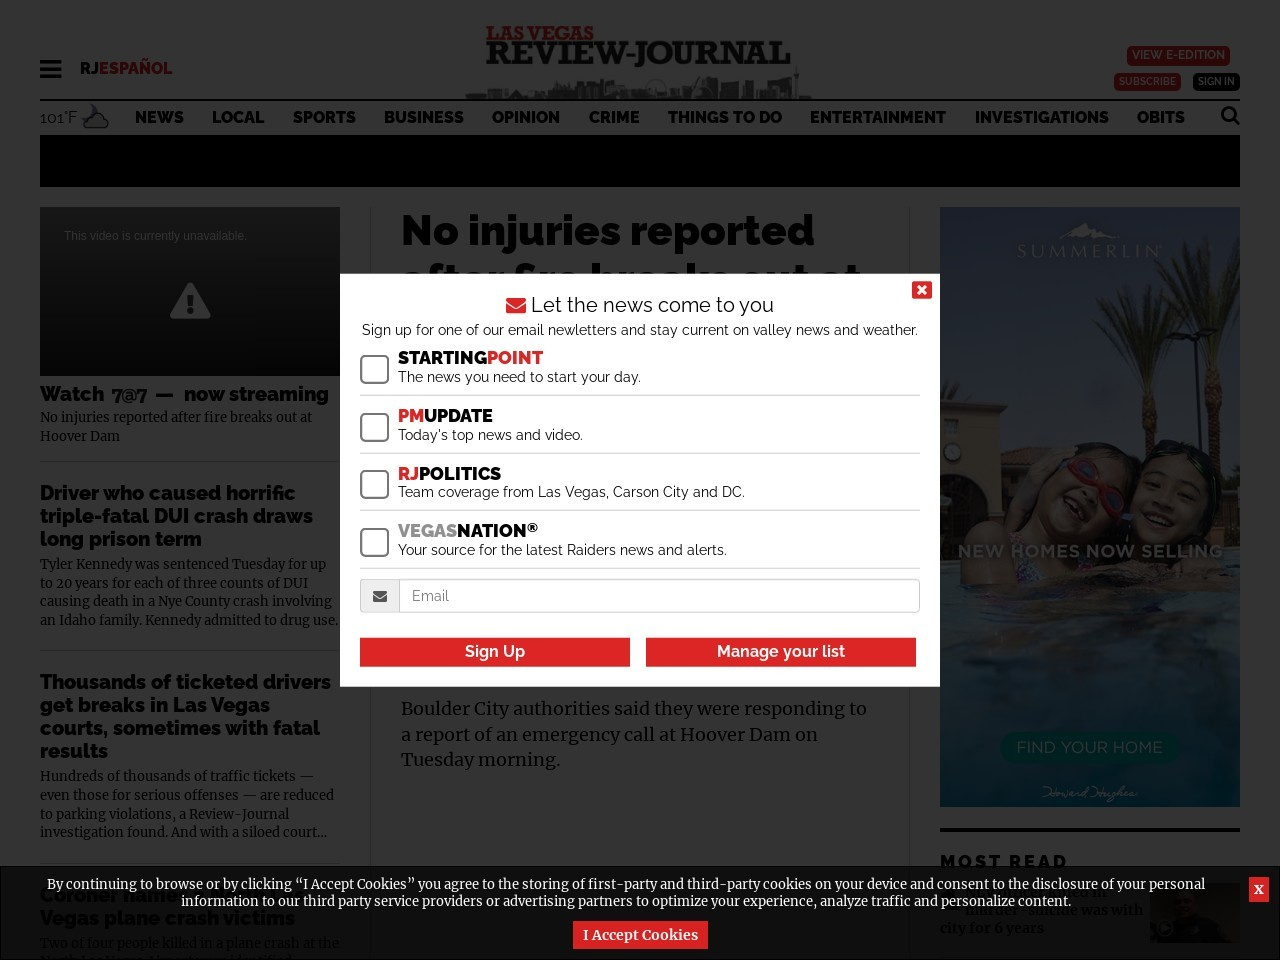 Home price gains in Seattle, Las Vegas lead US increases